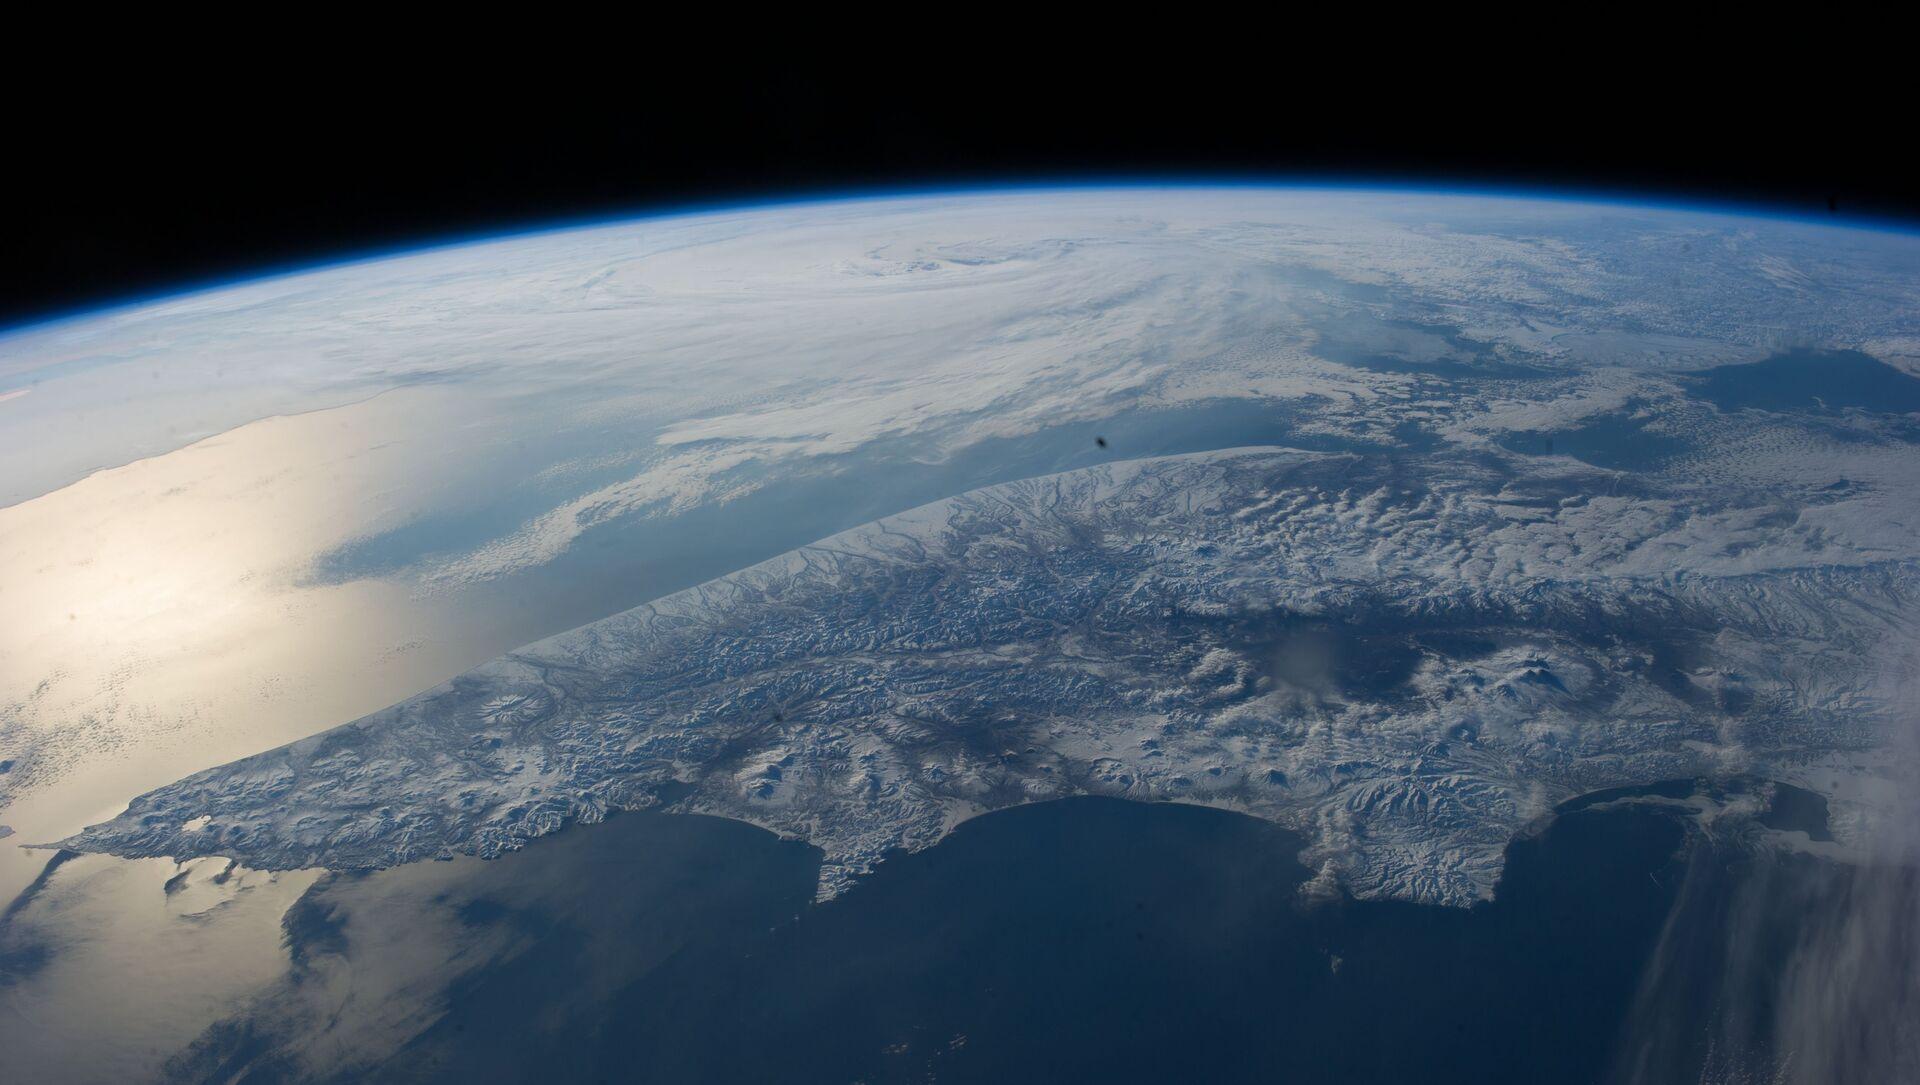 Terre vue de l'espace - Sputnik France, 1920, 03.04.2021